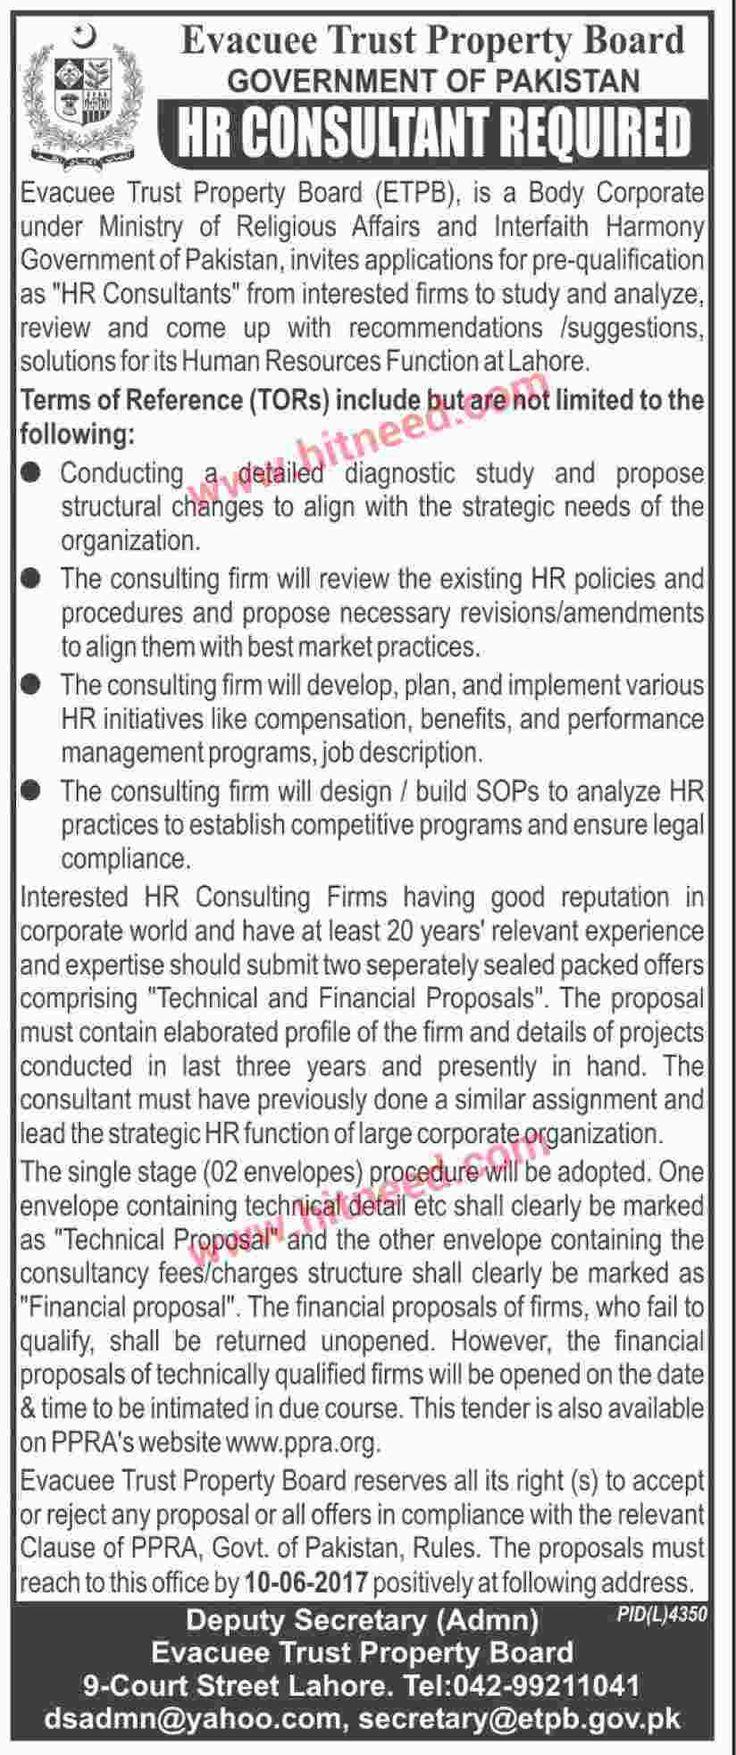 Evacuee Trust Property Board (ETPB), Government of Pakistan, HR Consultant Job, June 2017 Last Date: 10-06-2017   #HR Consultant #Lahore Jobs